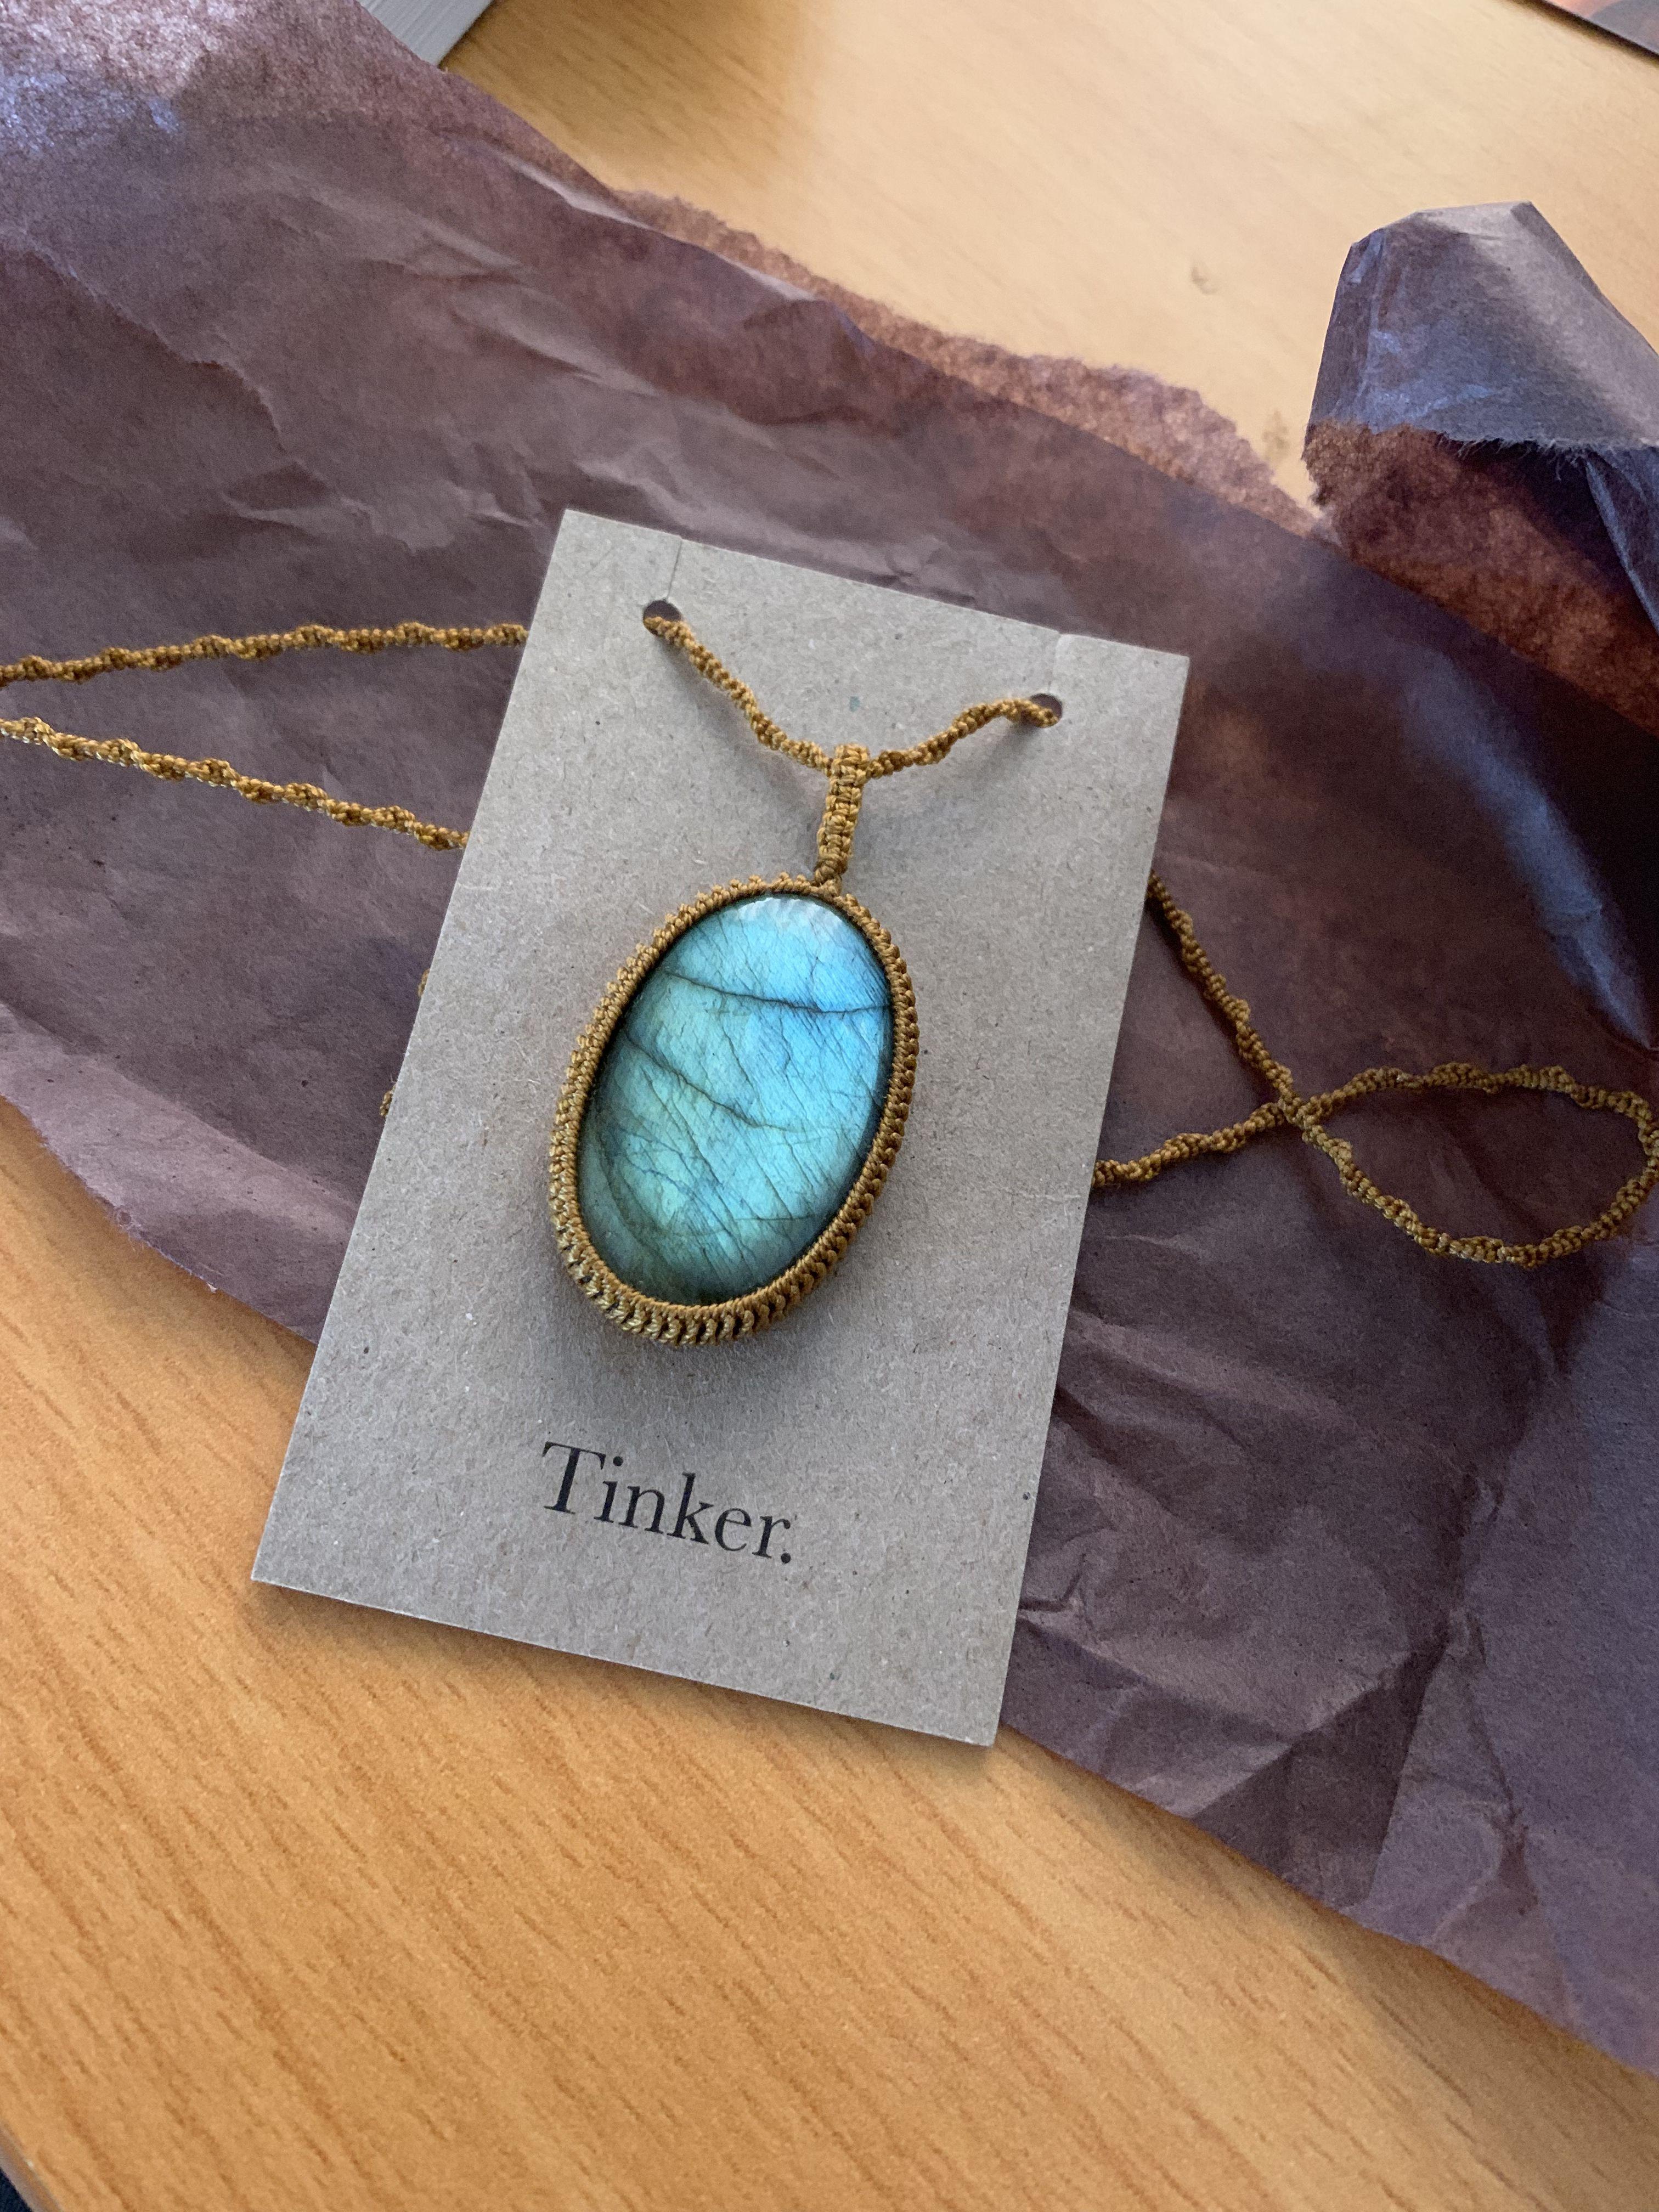 Pin on Jewellery